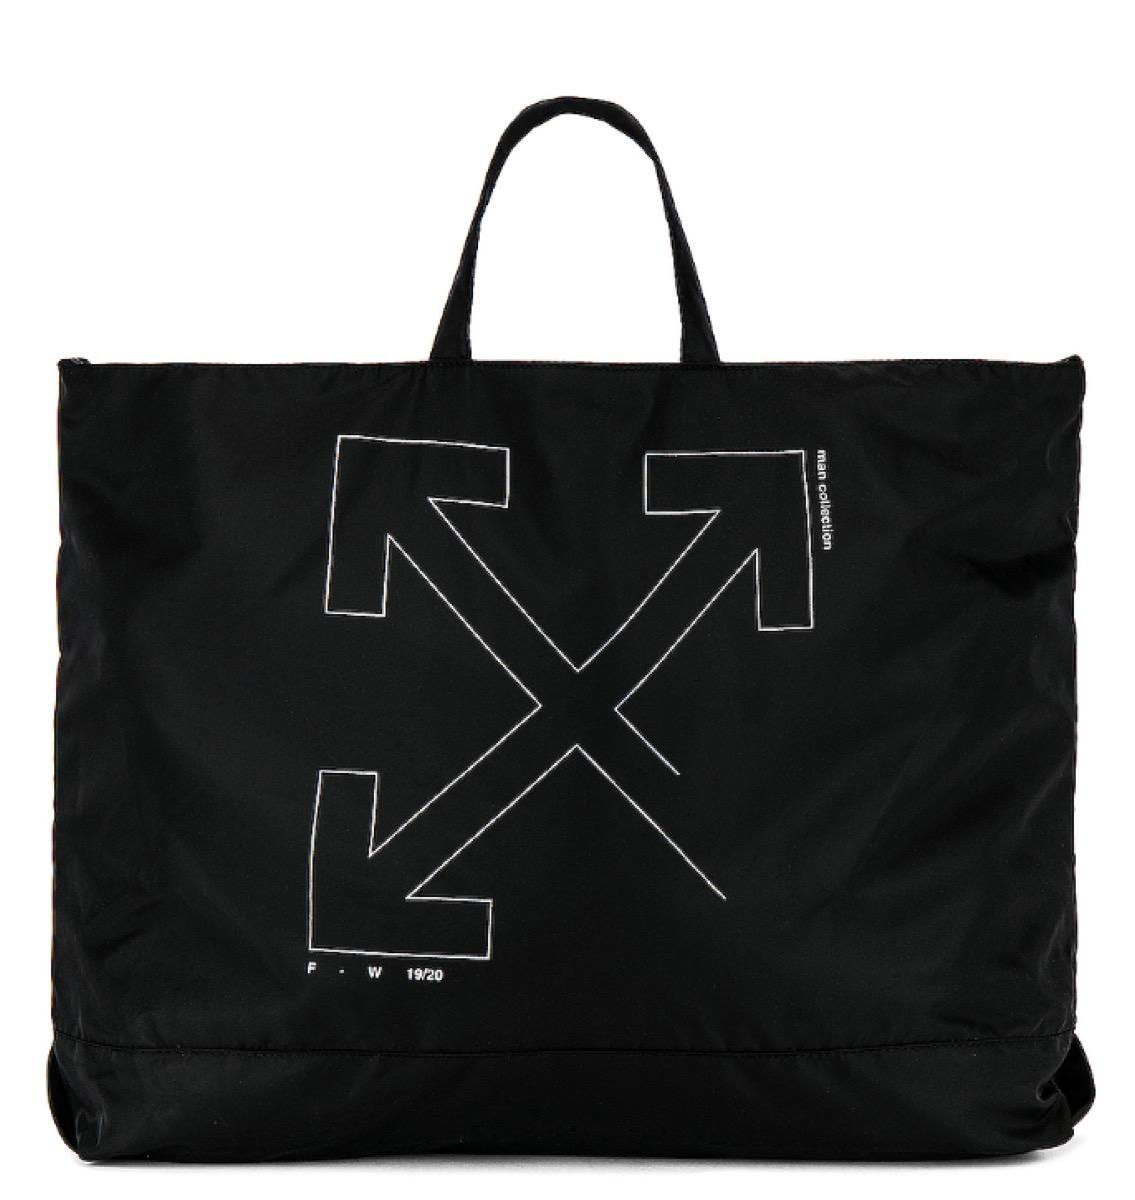 black bag with off-white logo, luxury beach bags